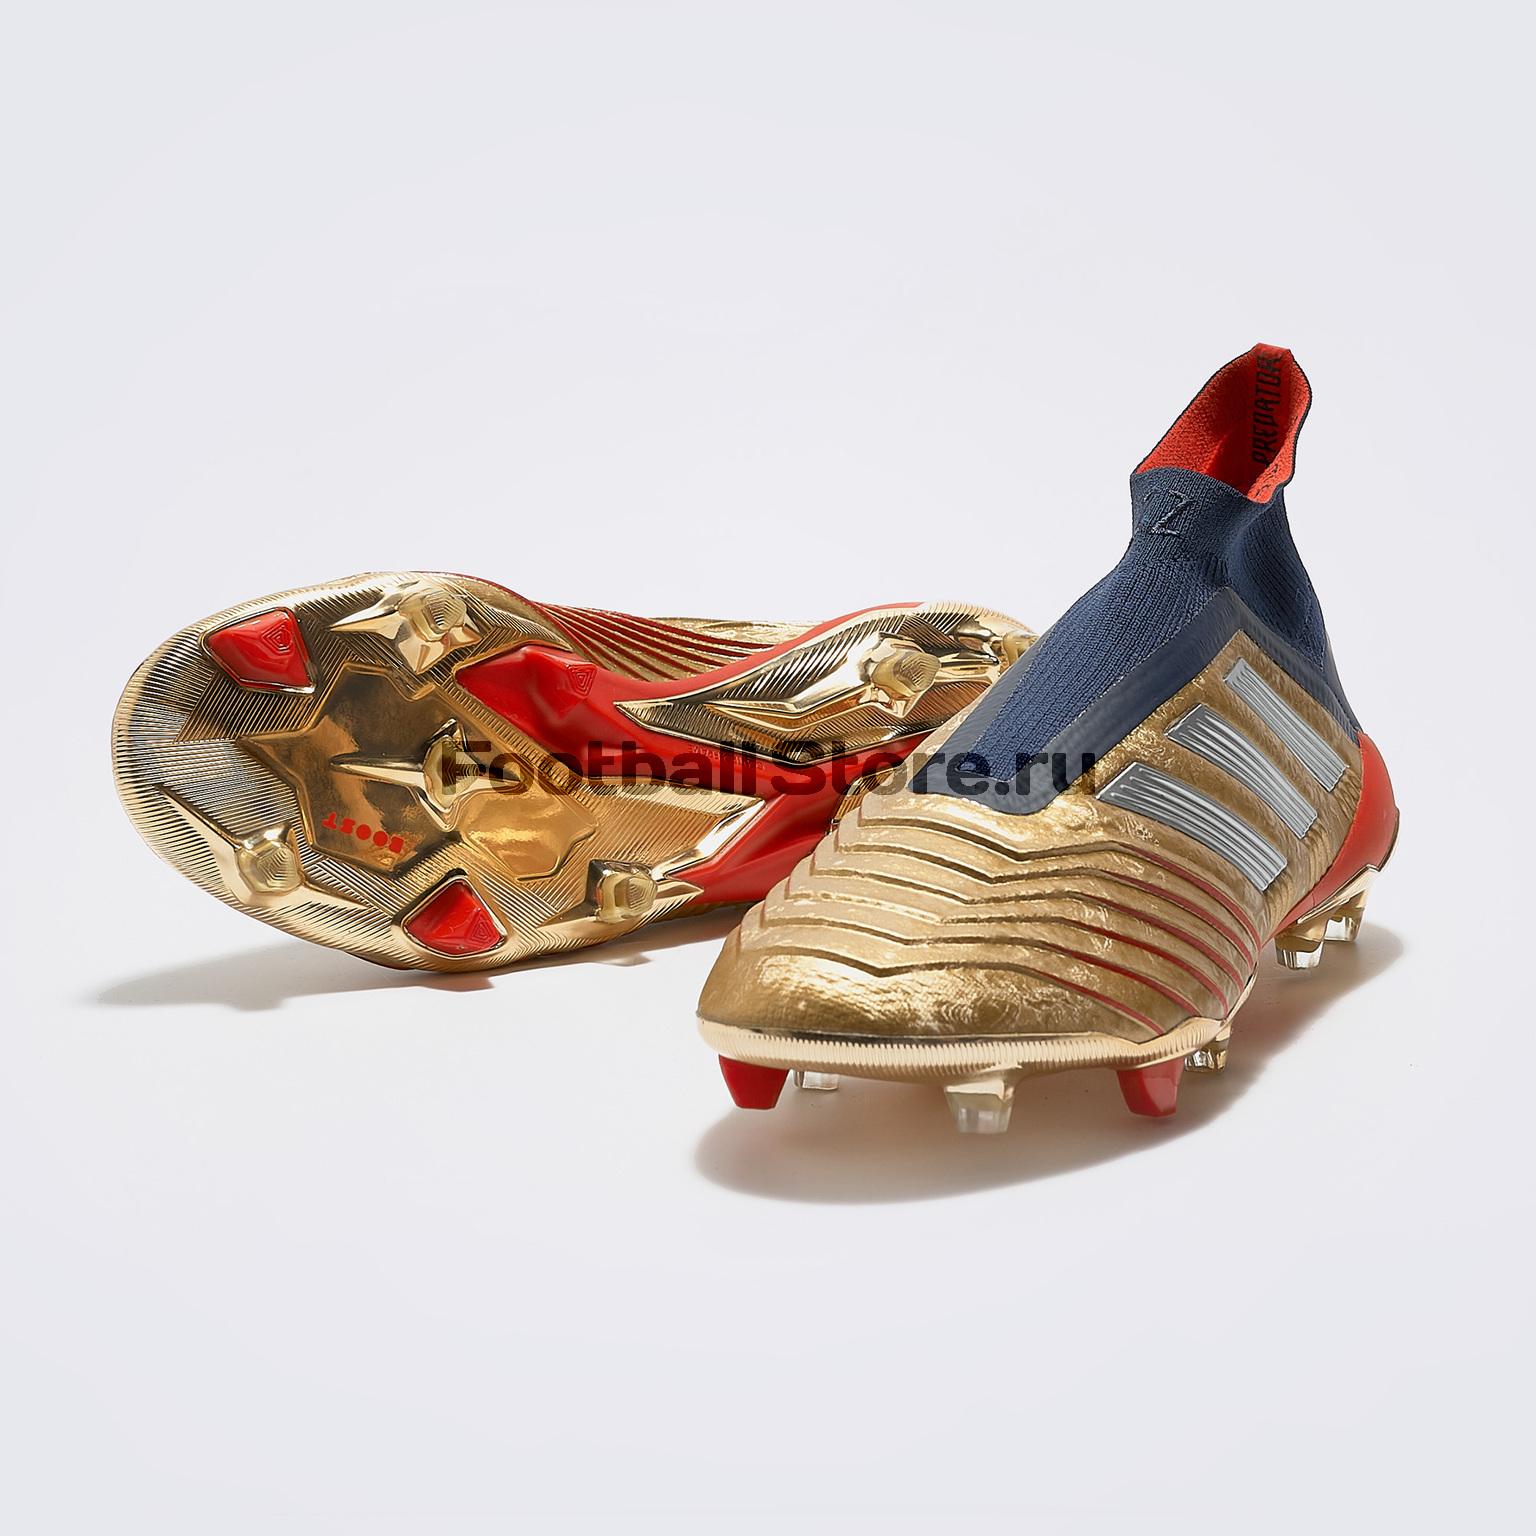 Бутсы Adidas Predator 19+ FG Zidane/ Beckham boots G27781 zidane